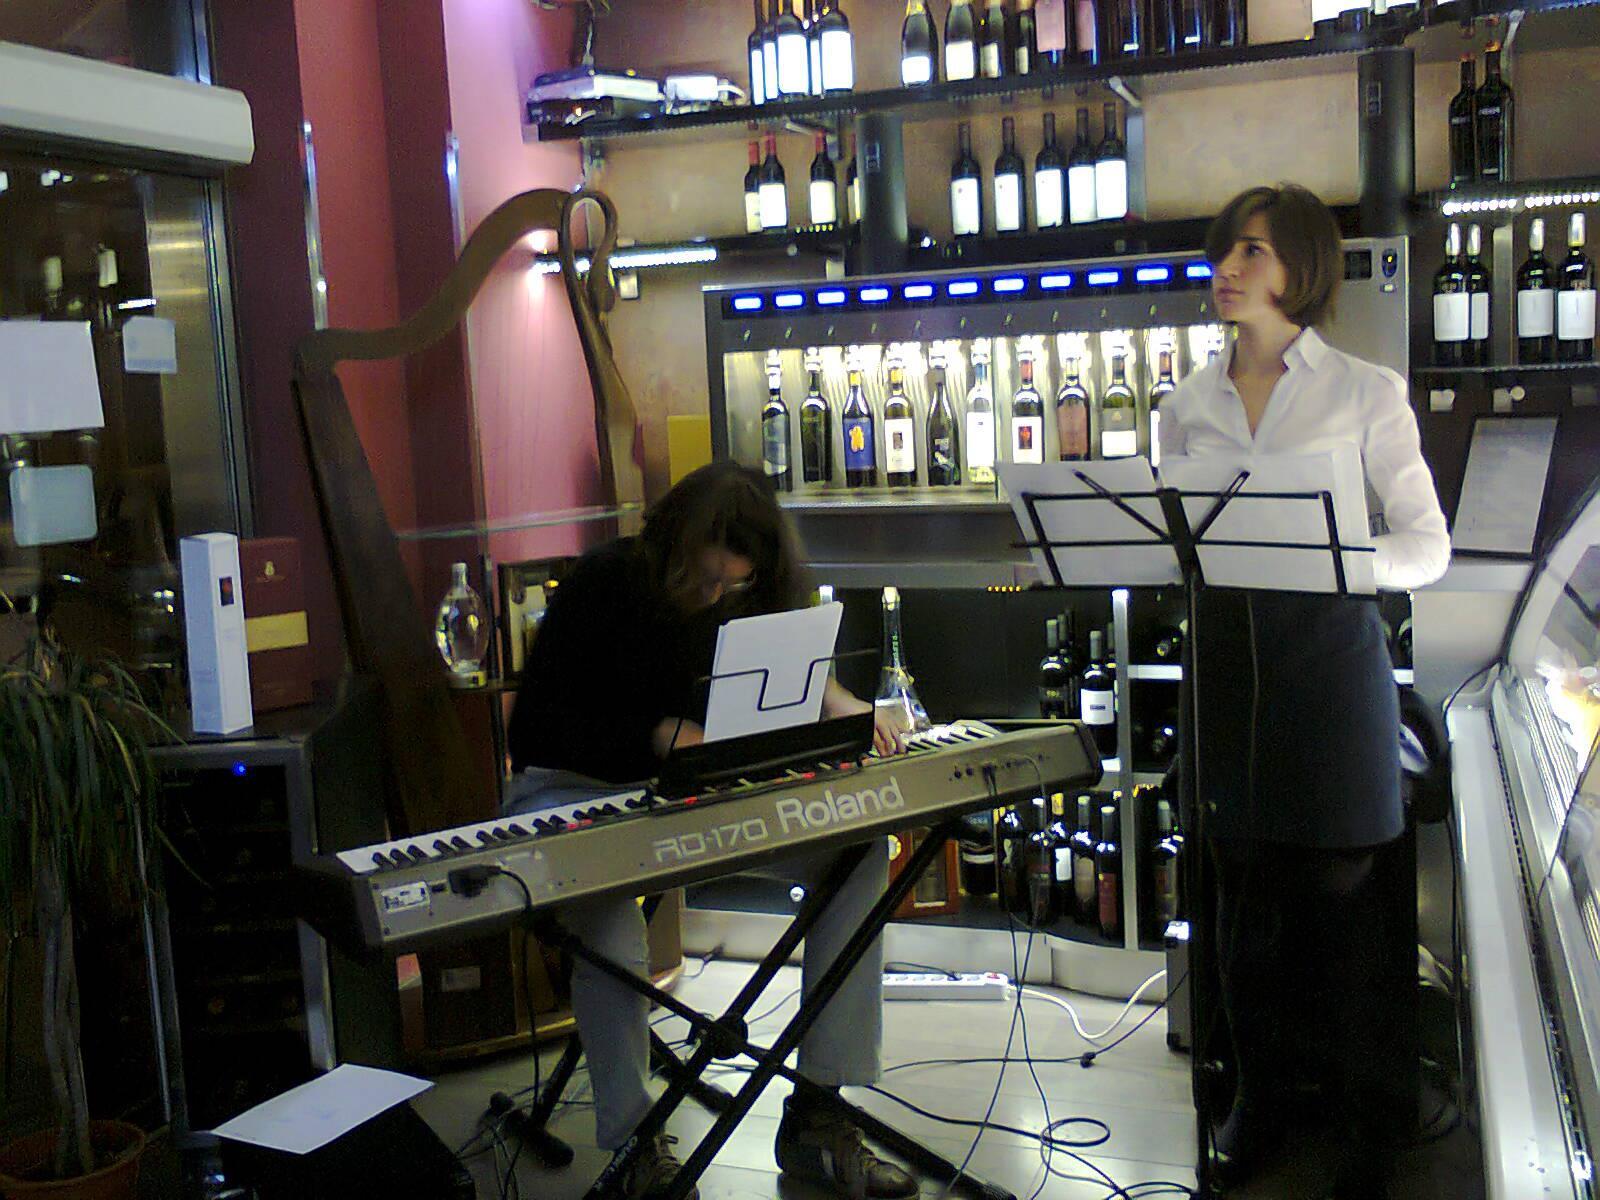 Andrea ed Elena Schirru Jazz Duo, Lunedì 10 Giugno al Monday Acoustic Dinner